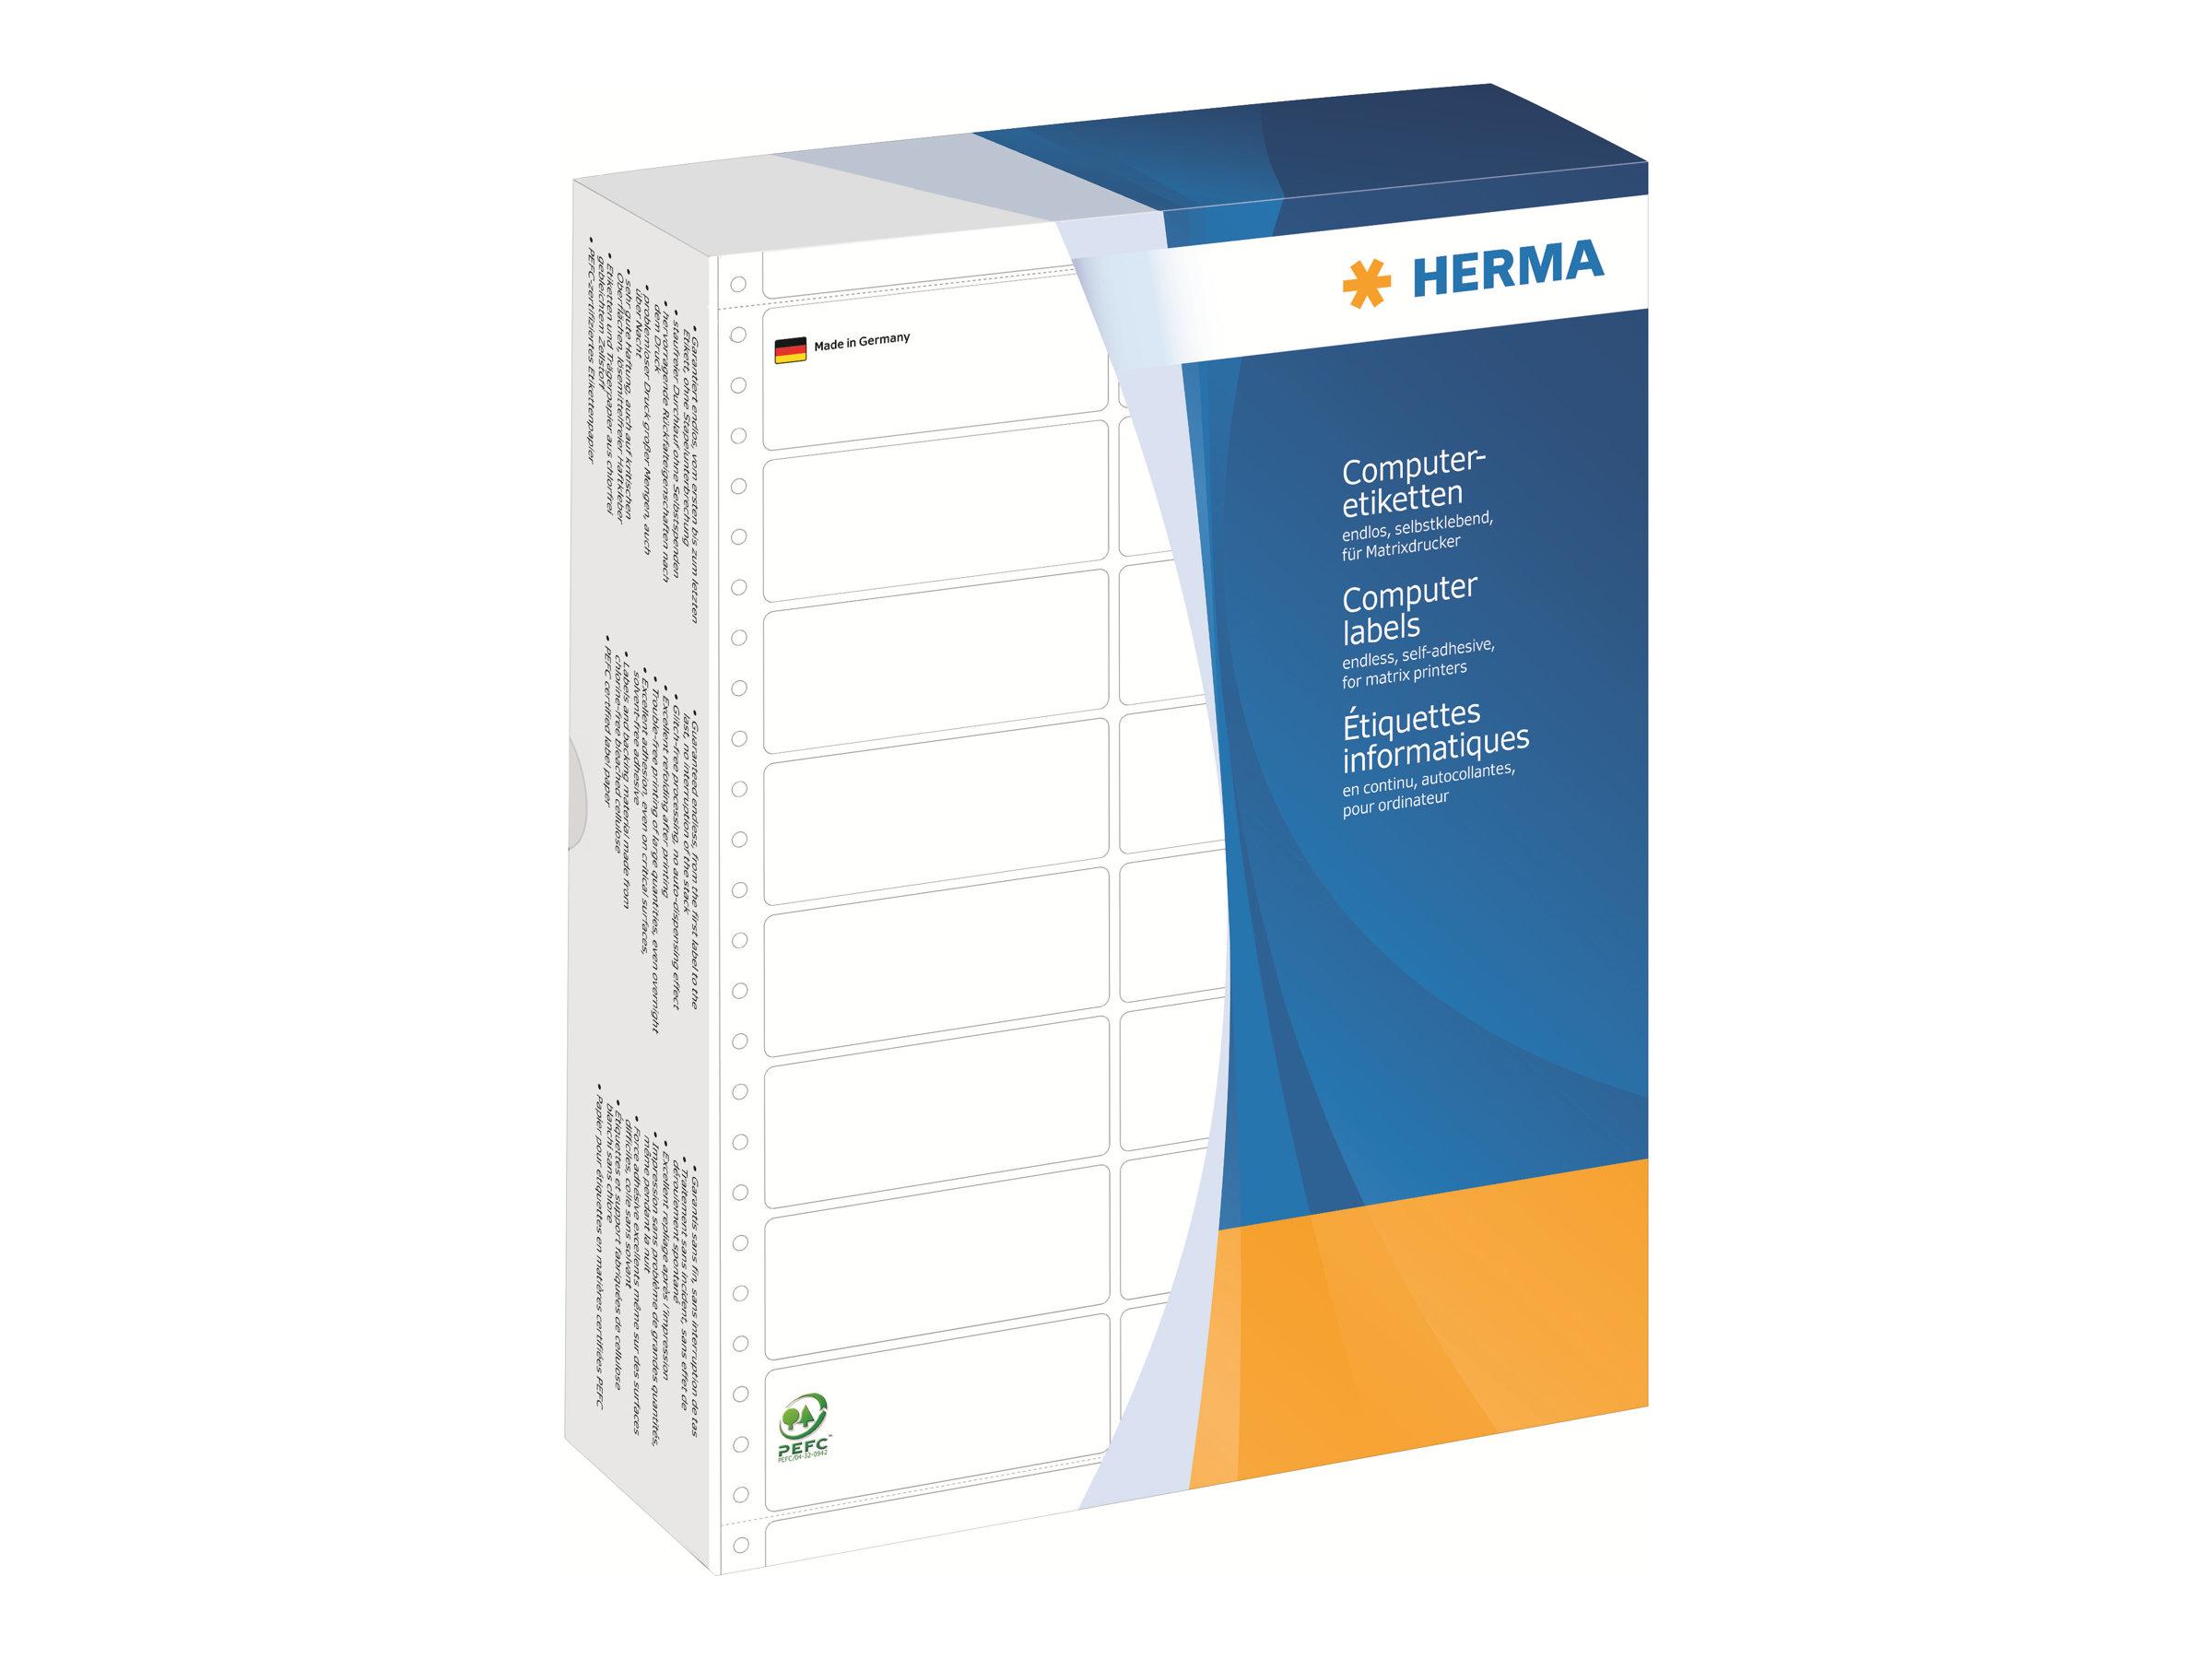 HERMA Computer labels - Papier - matt - permanent selbstklebend - perforiert - weiß - 101.6 x 35.7 mm 8000 Etikett(en) (2 Bogen x 4000)